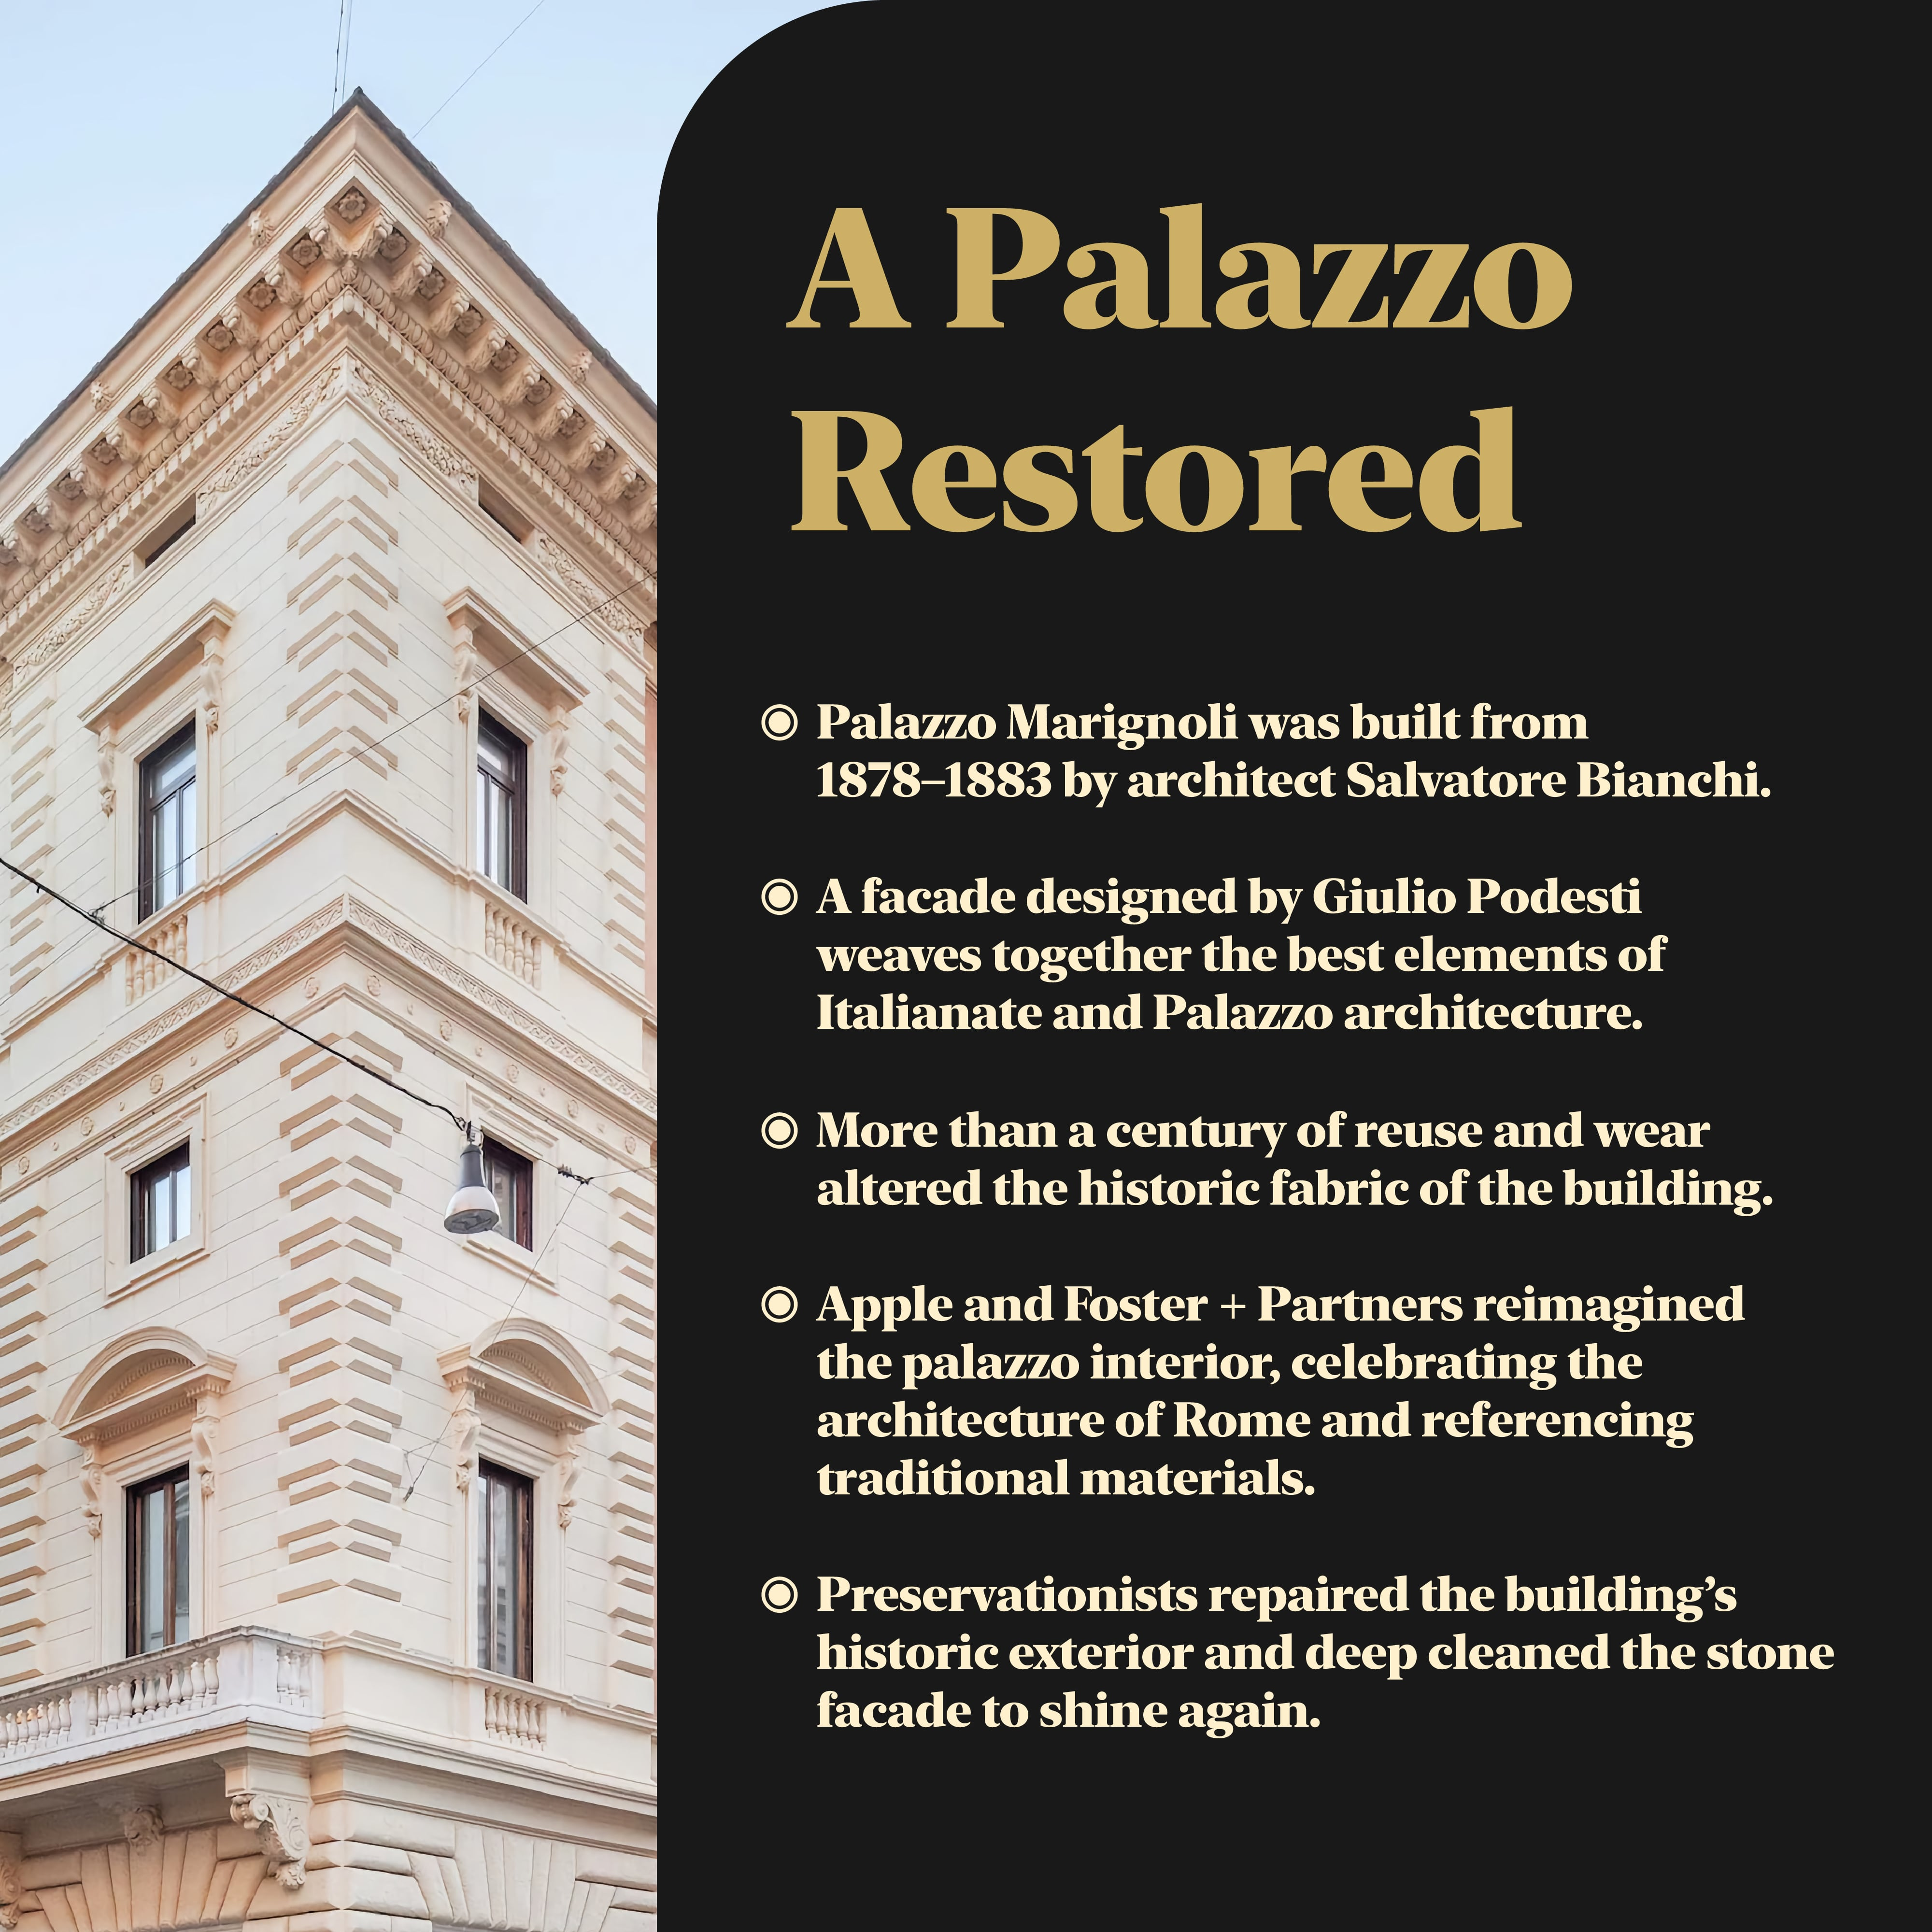 Historic details of Palazzo Marignoli.